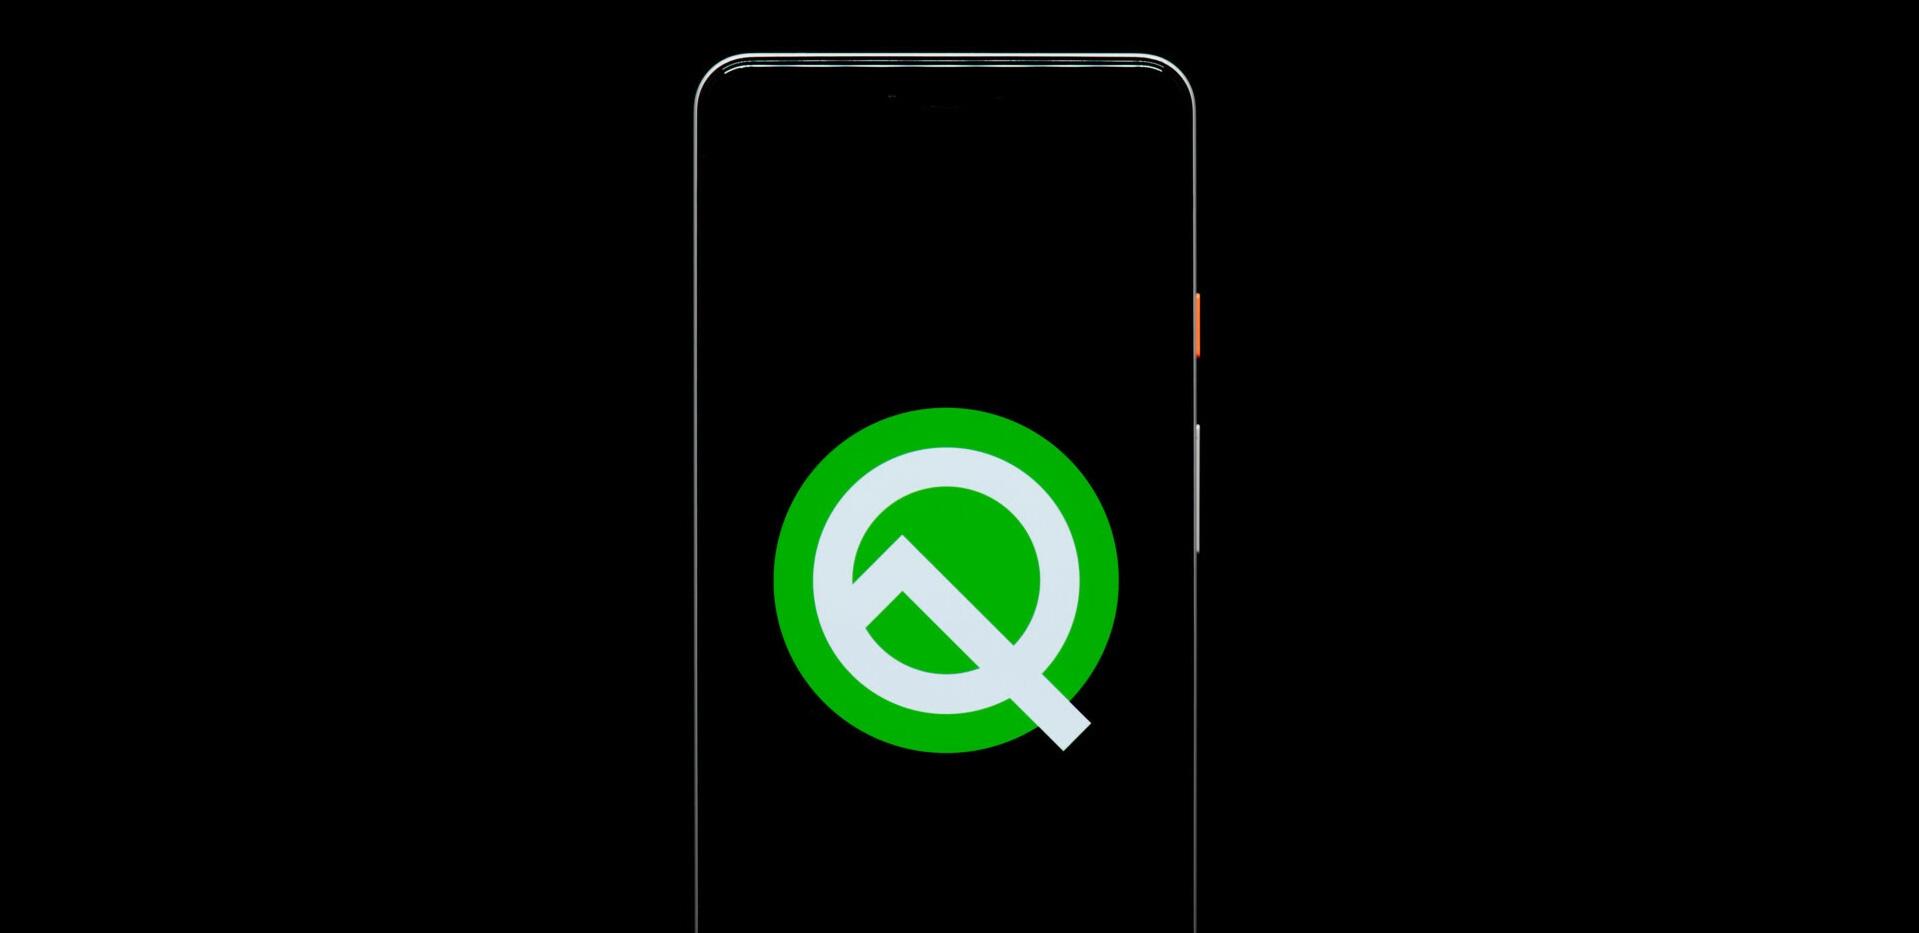 Android Q Beta 4